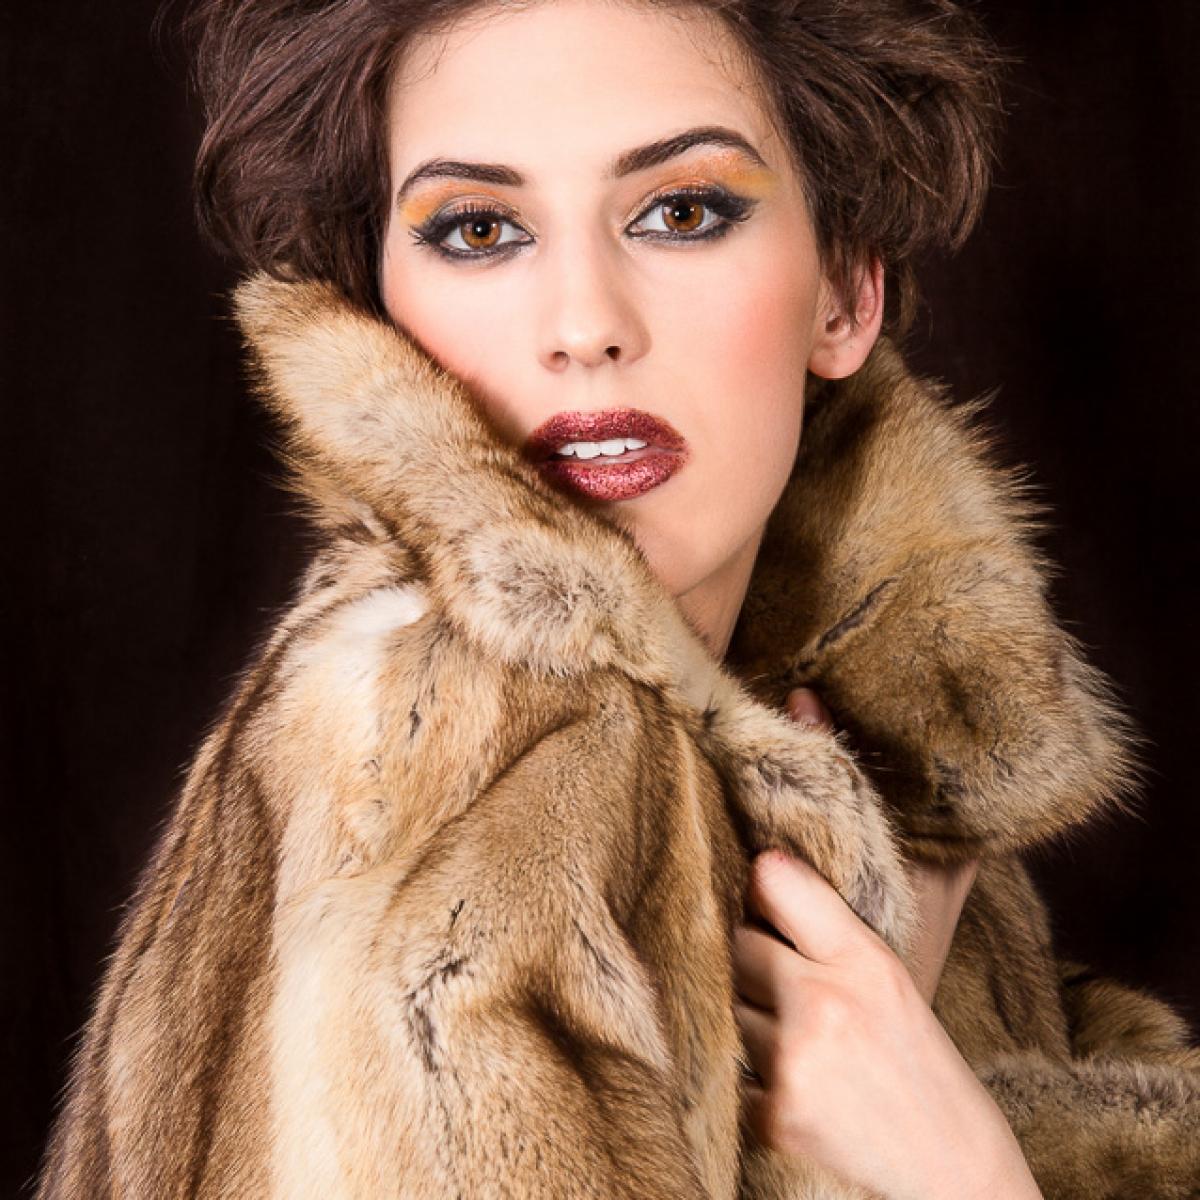 portrait, photographe, photographie, marwan moussa, coiffeur, coiffure, mariocoiffe, mario coiffe, lightroom, frank provost, studio, femme, make-upباريس, مروان موسى, مصور